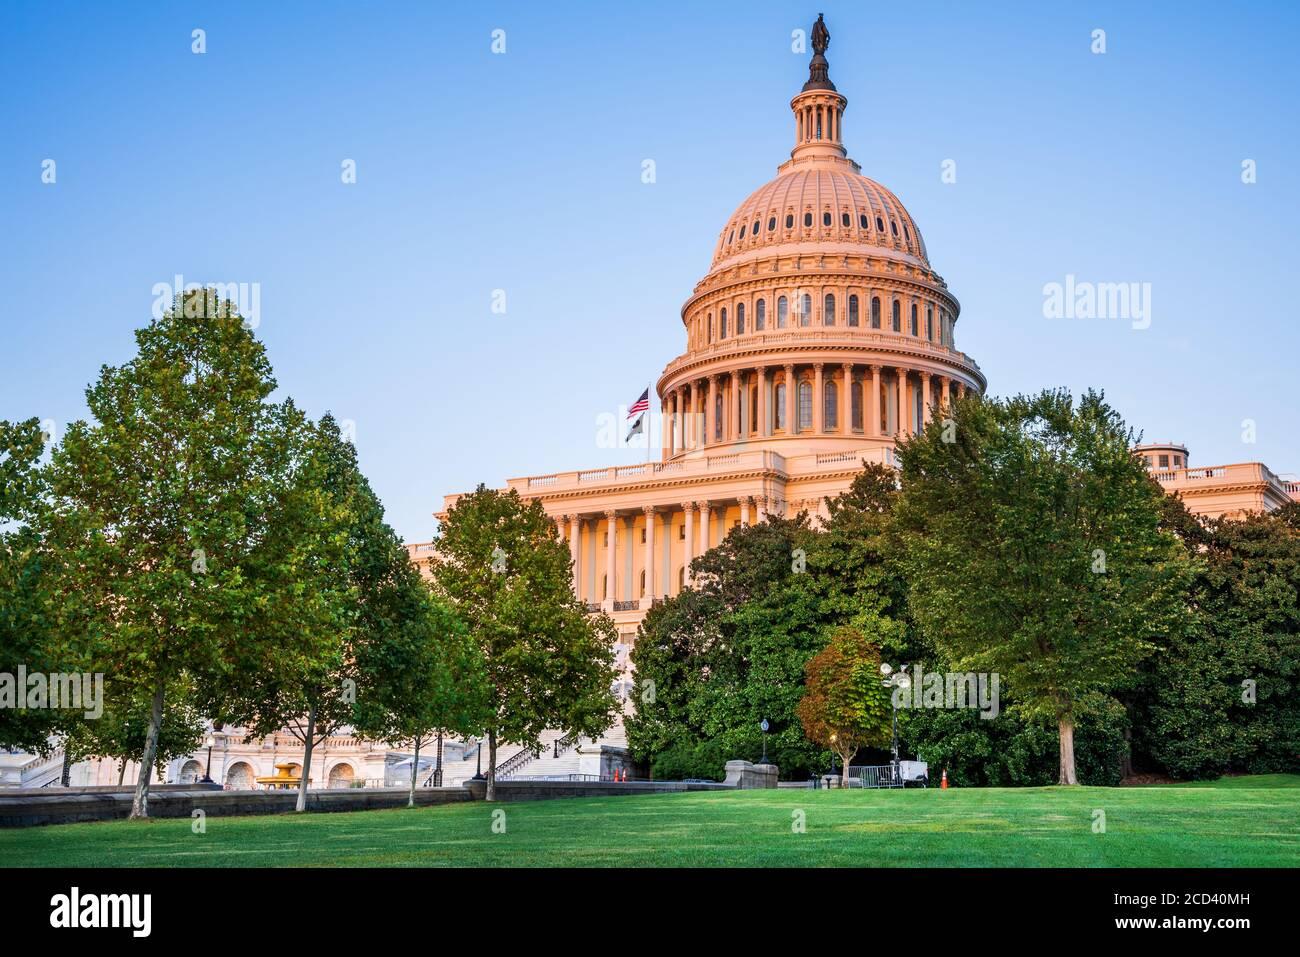 Washington DC, USA - The United States Capitol building at twilight. Stock Photo